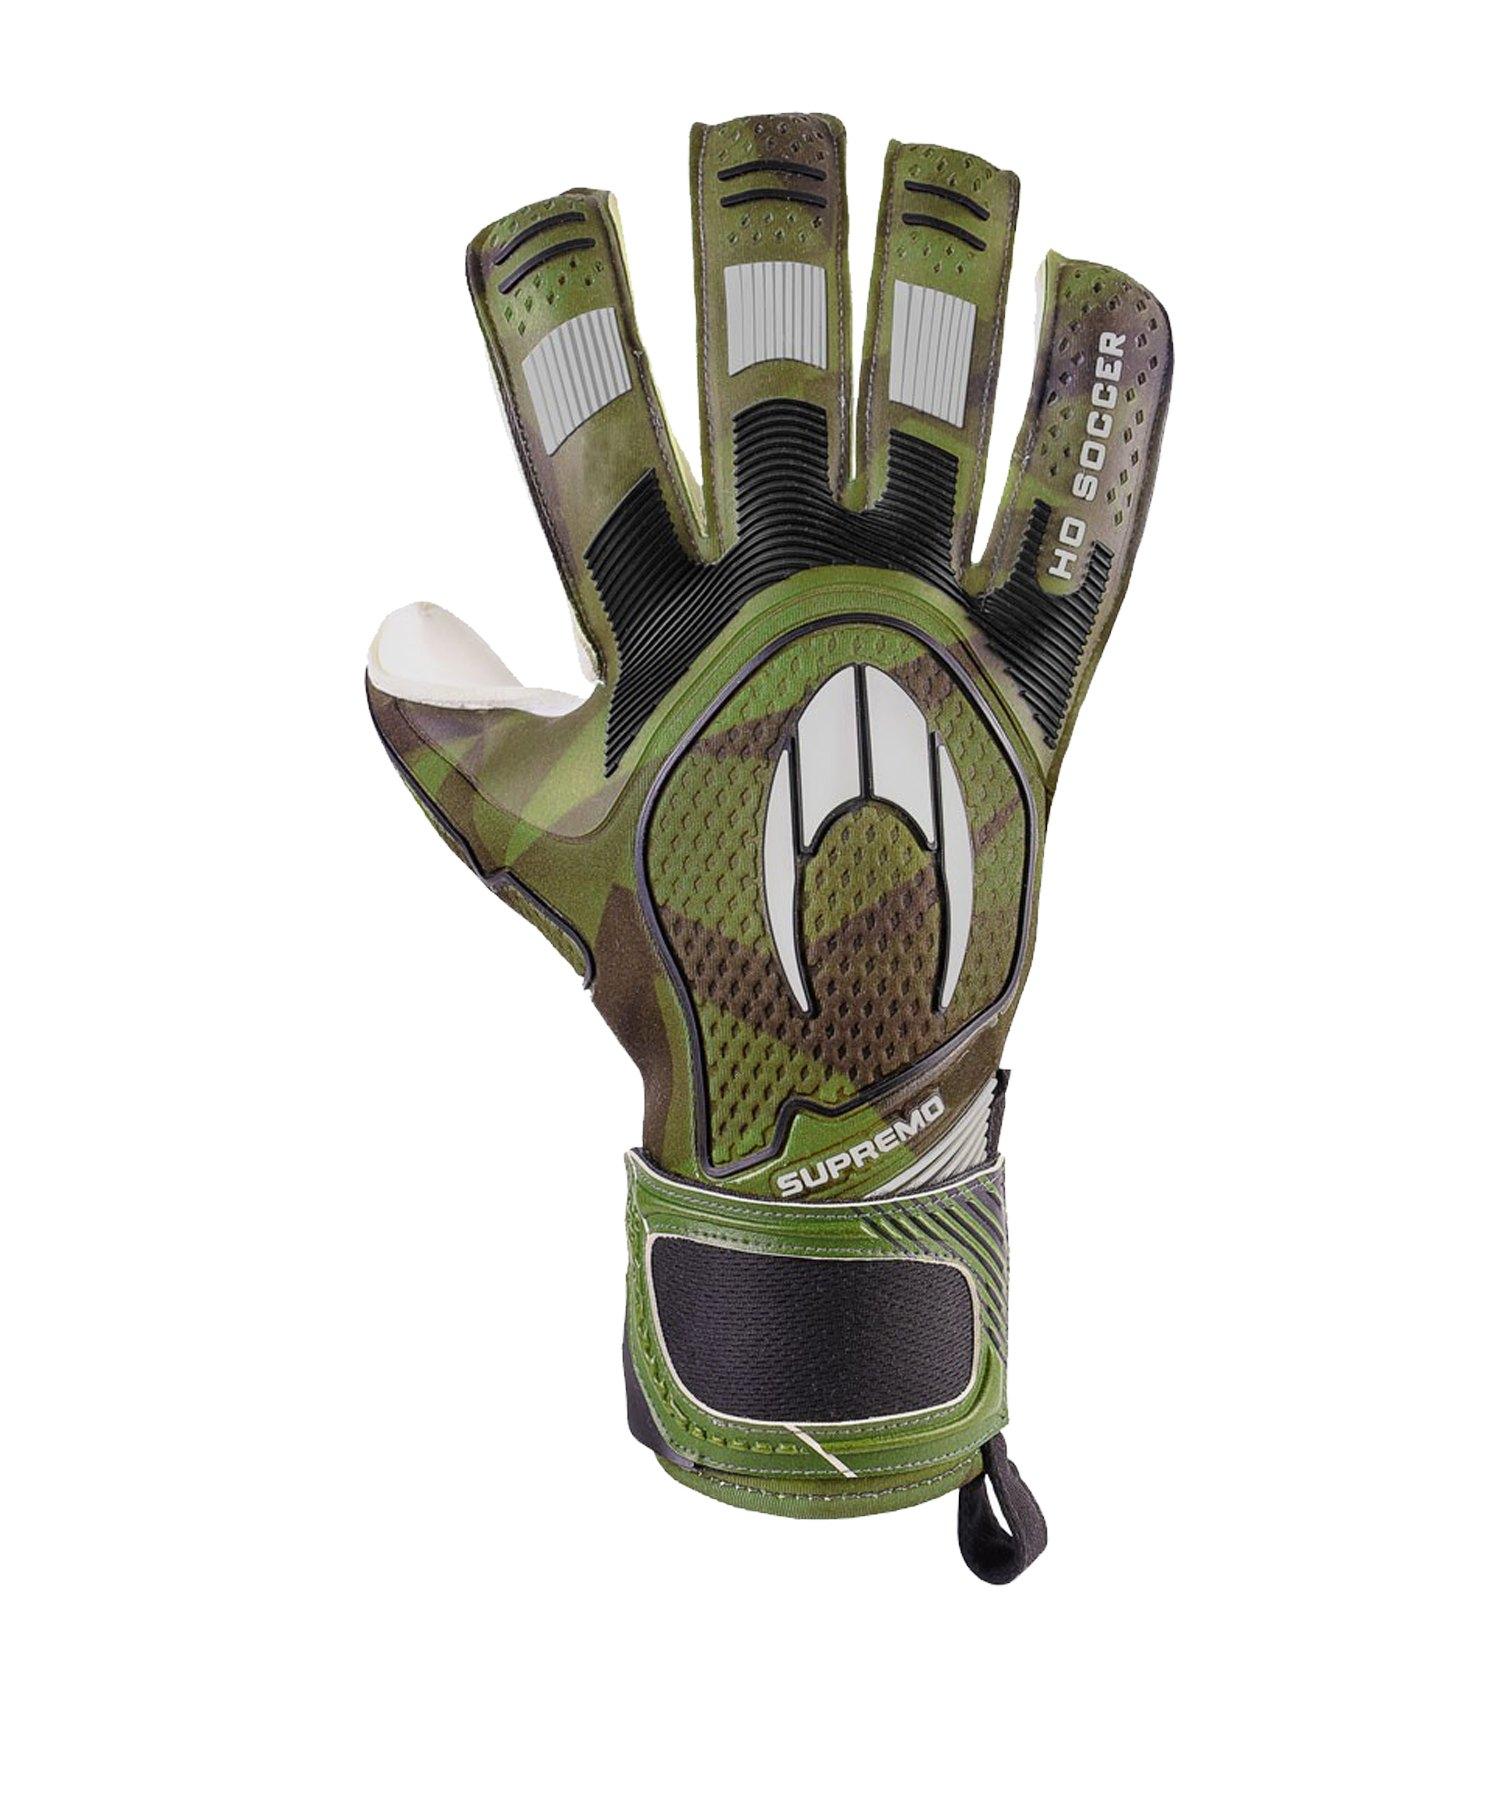 HO Soccer SSG Supremo II Roll N TW-Handschuhe Grün - gruen